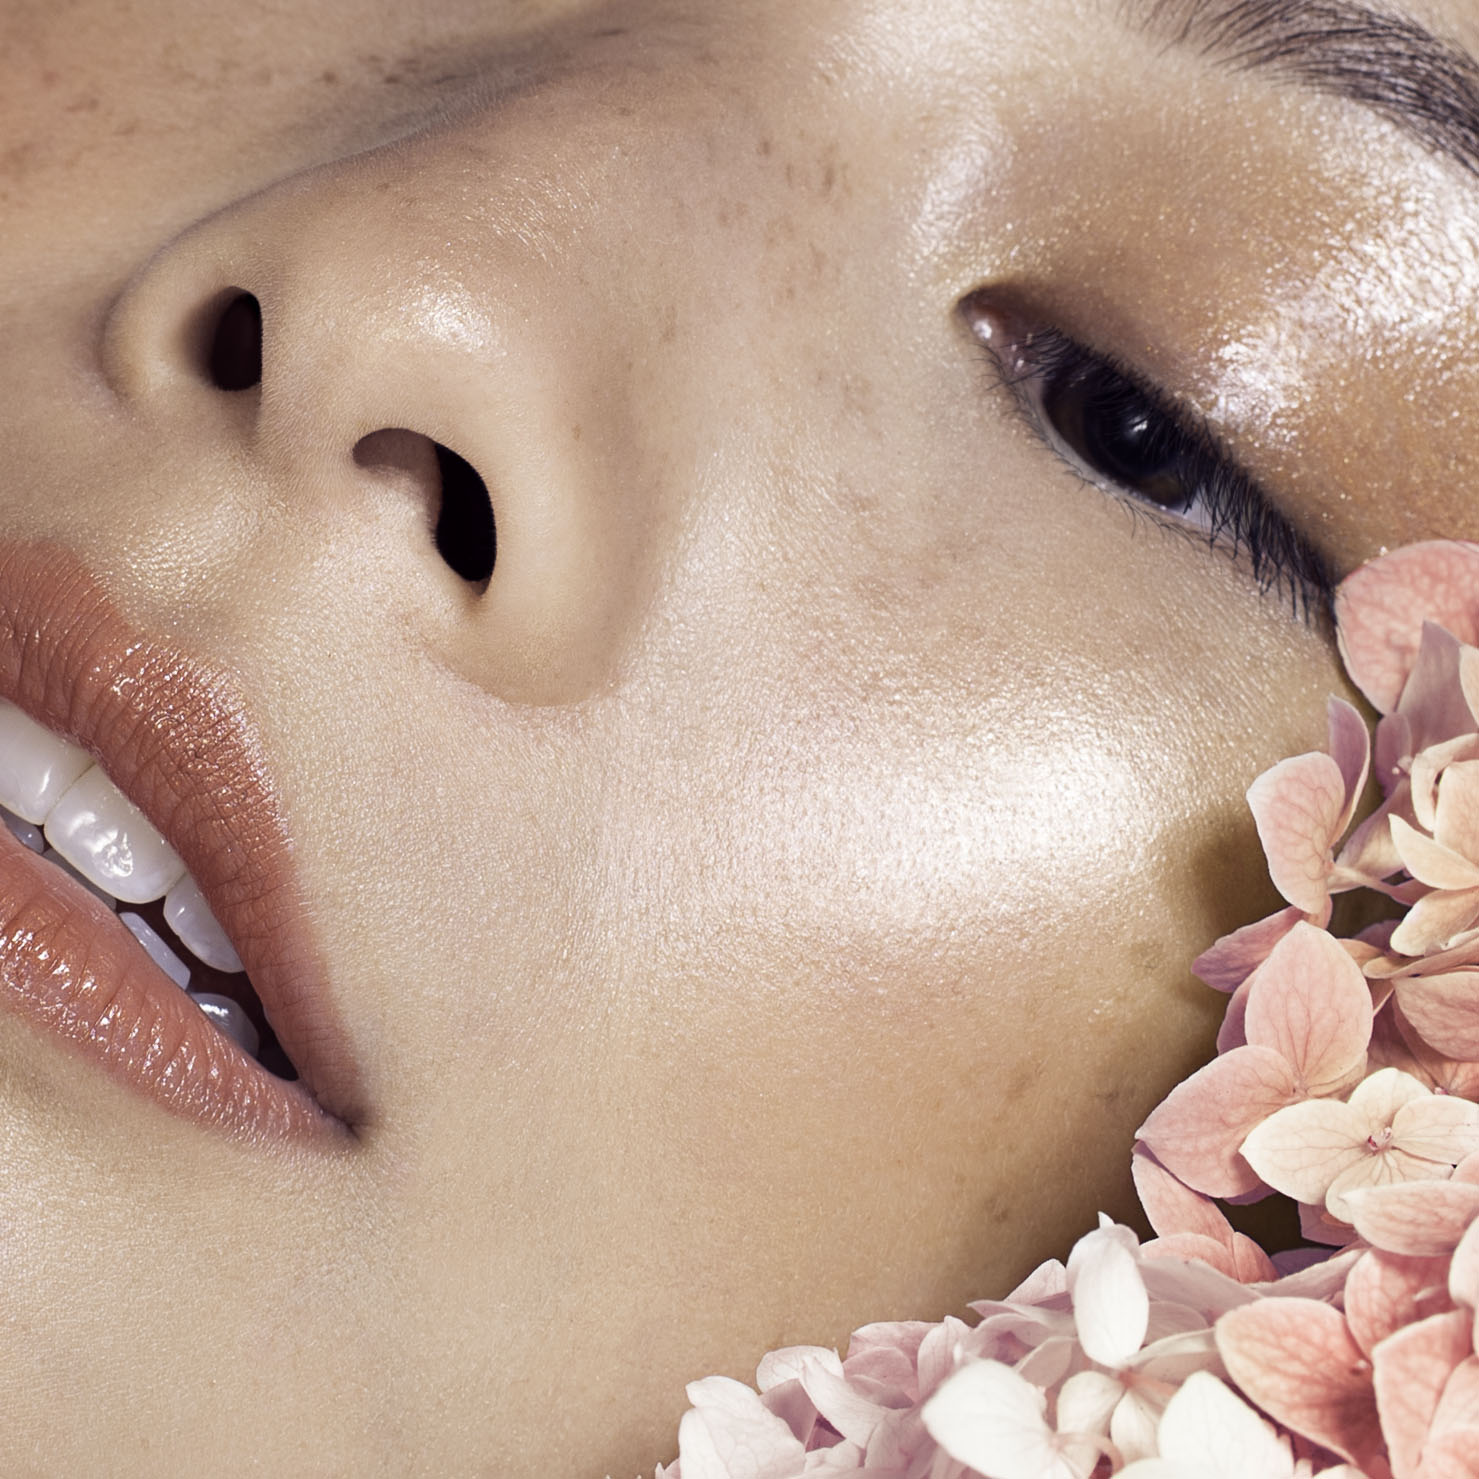 Beauty-Hue-Linh-074-Edit.jpg